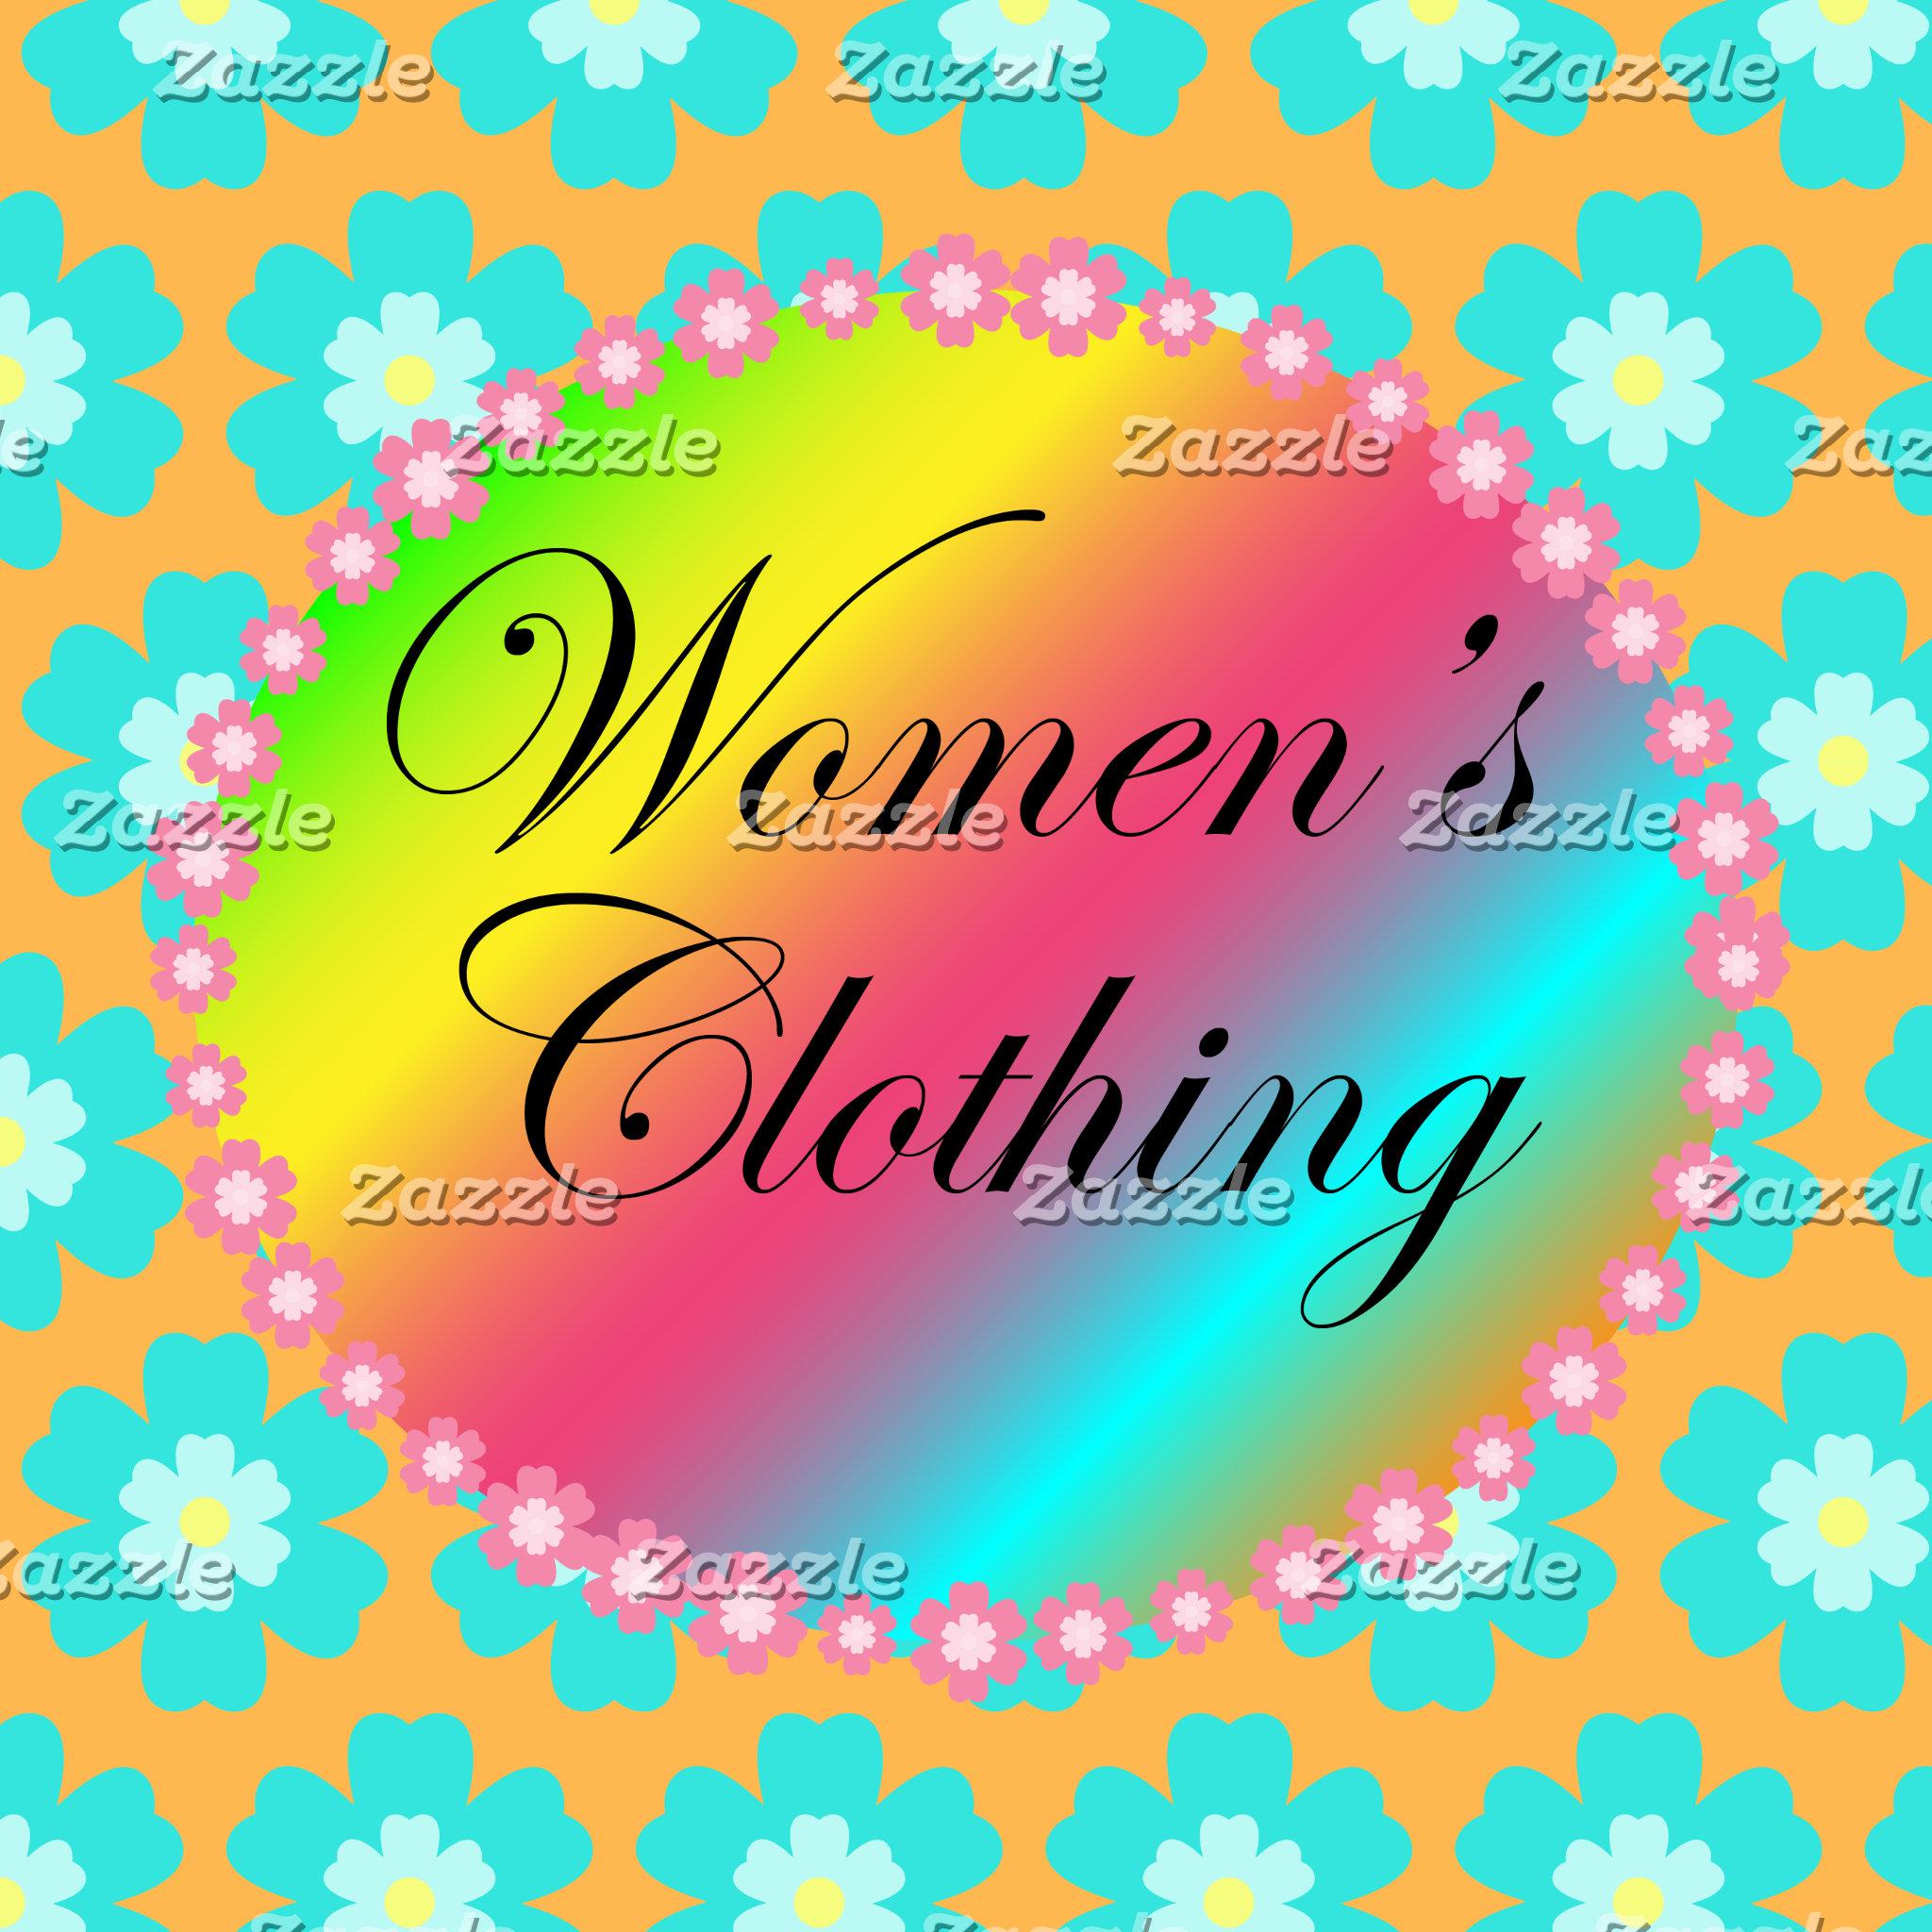 04. Women's Clothing